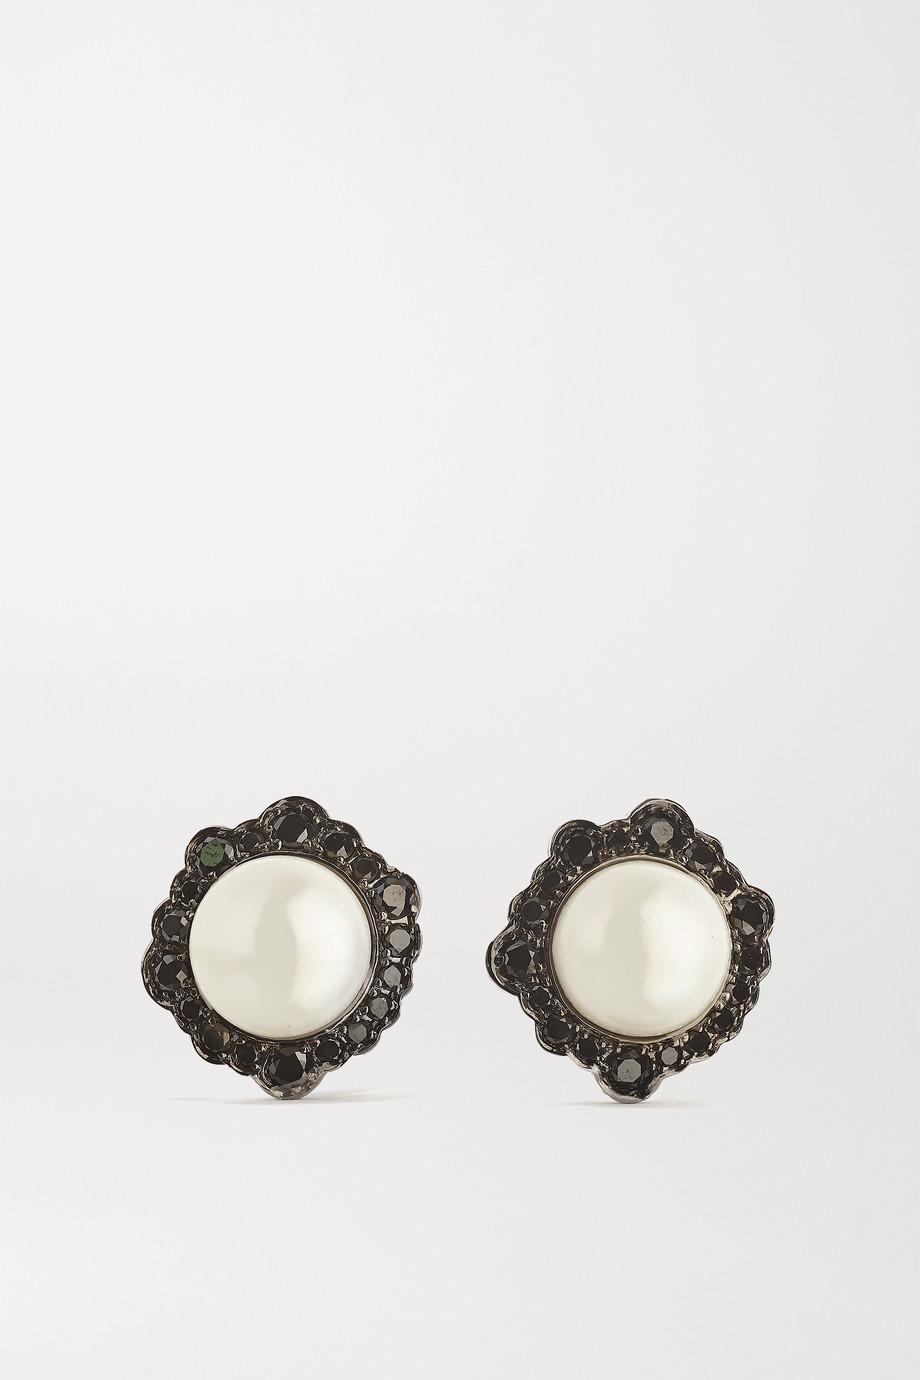 Kimberly McDonald Boucles d'oreilles en or blanc 18 carats noirci, perles et diamants